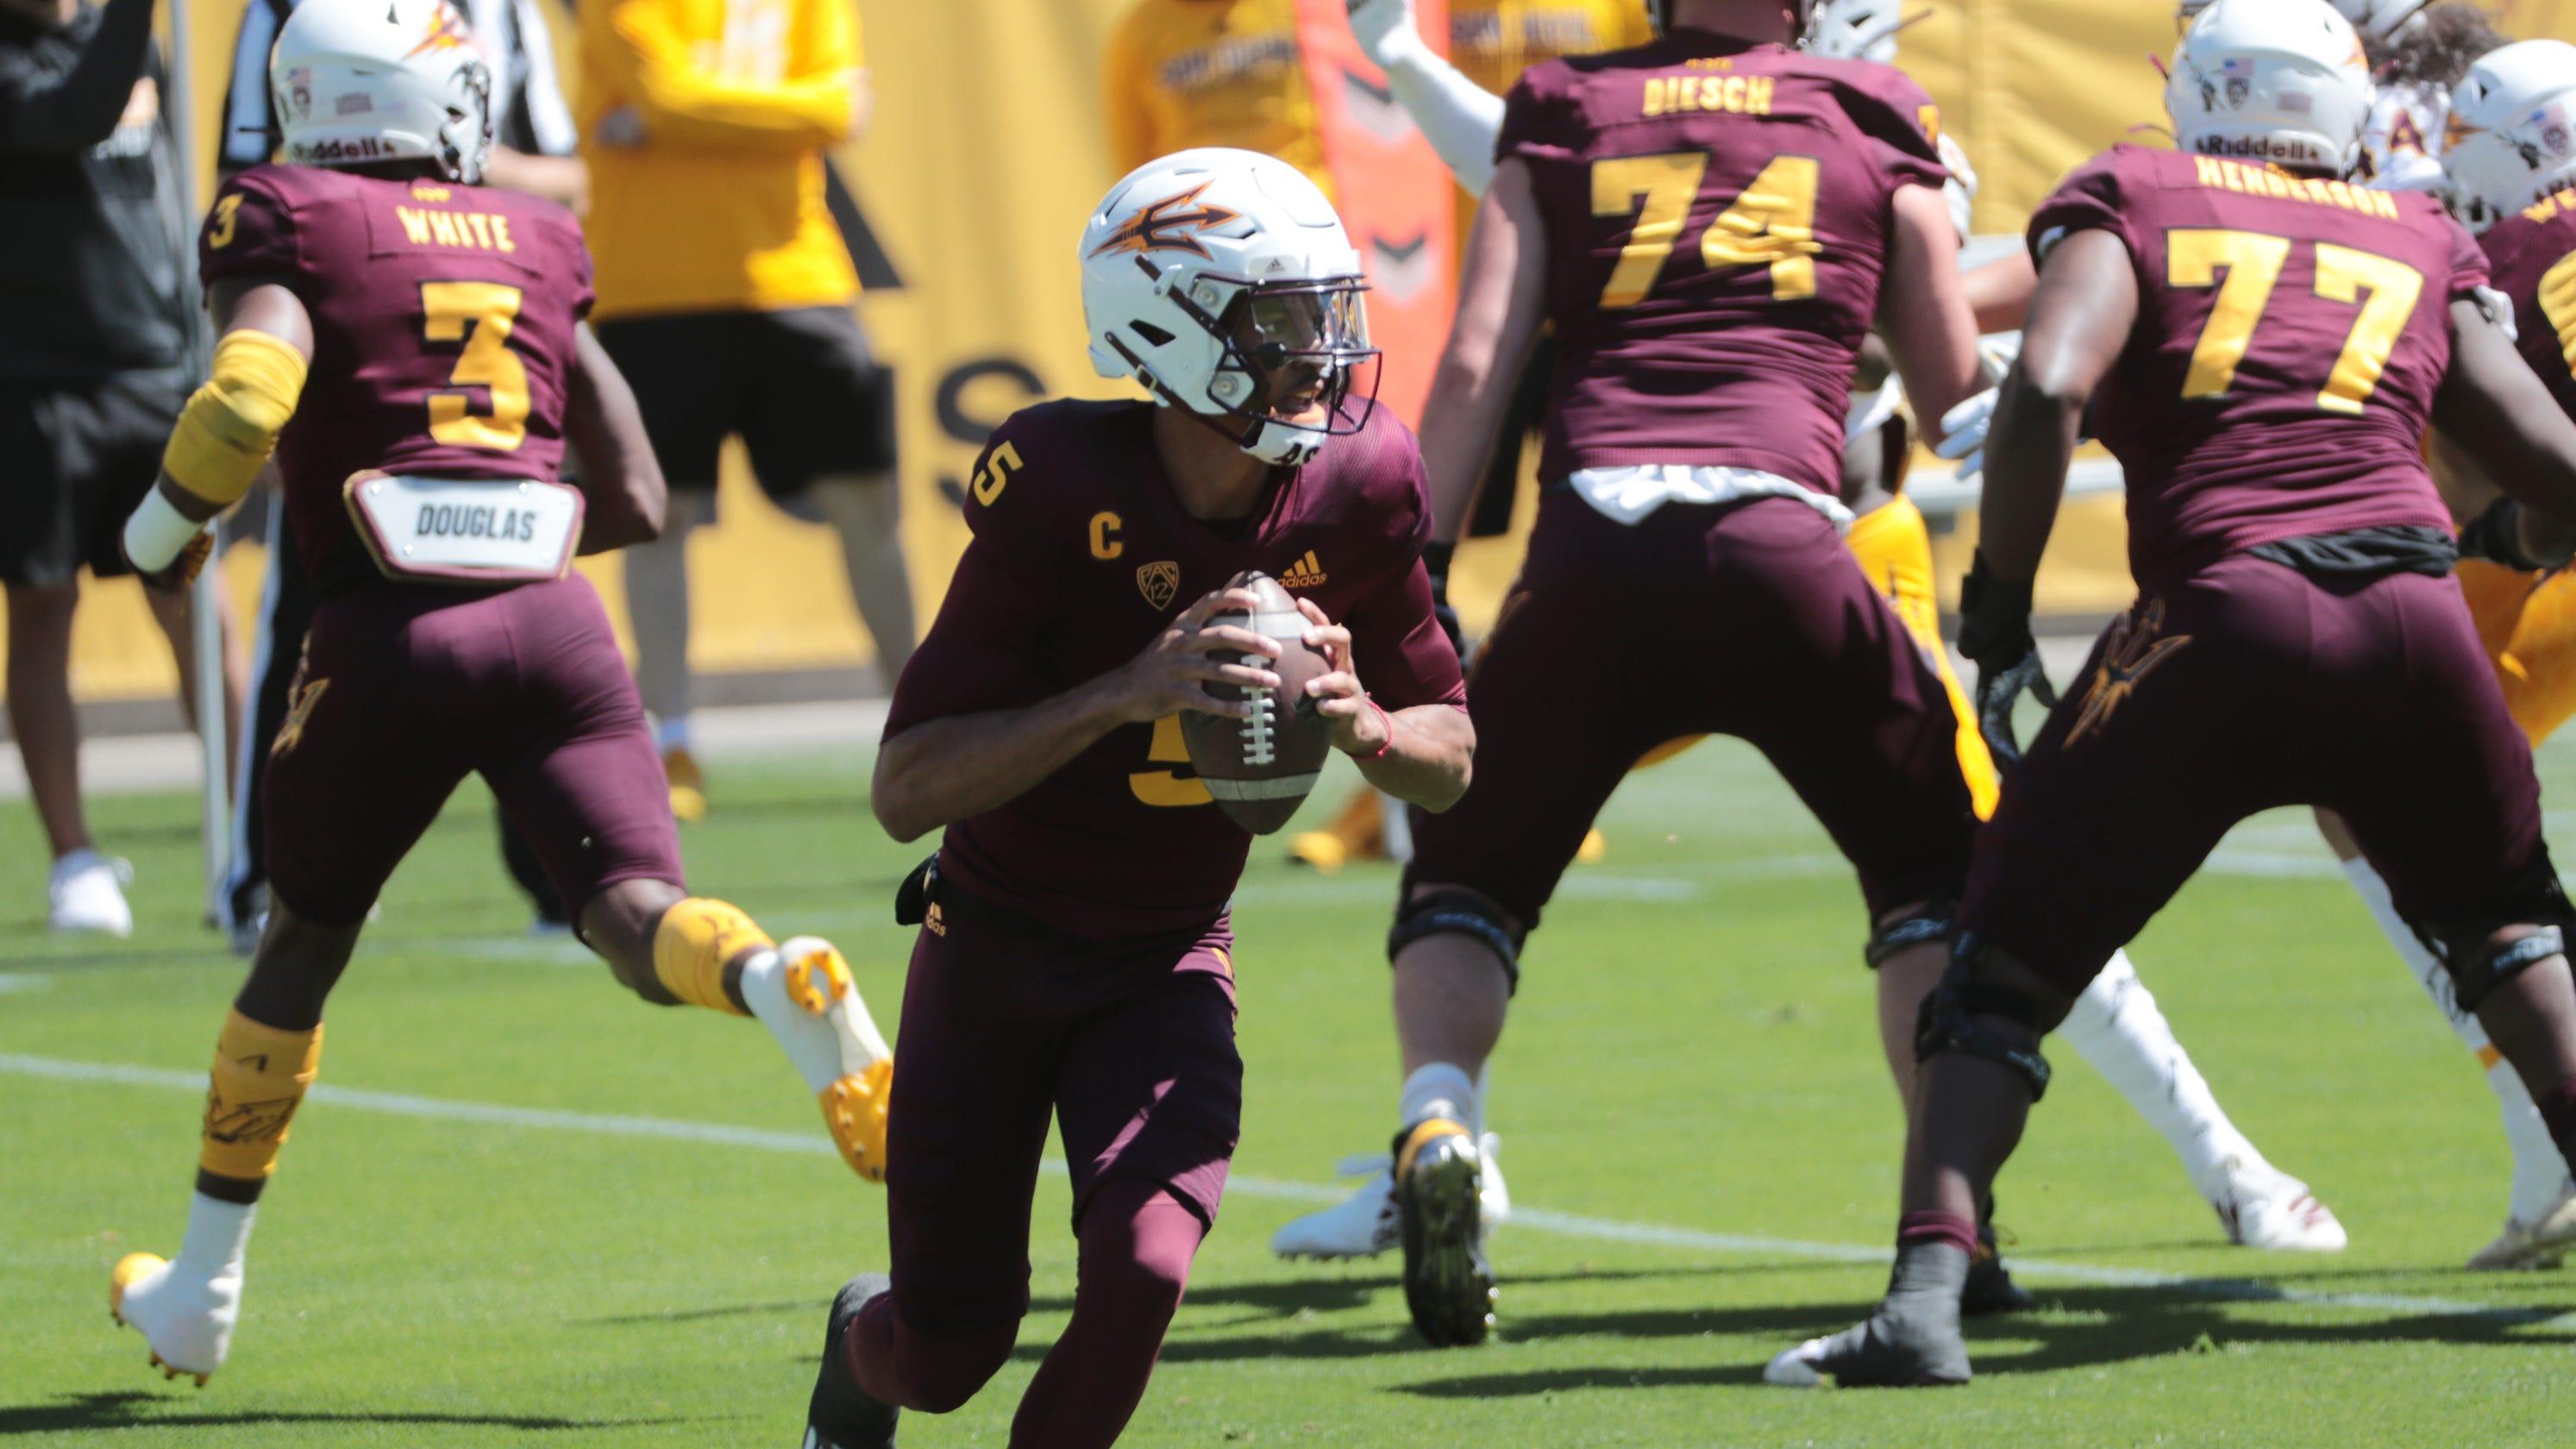 ASU football has chance to make College Football Playoff, national championship game